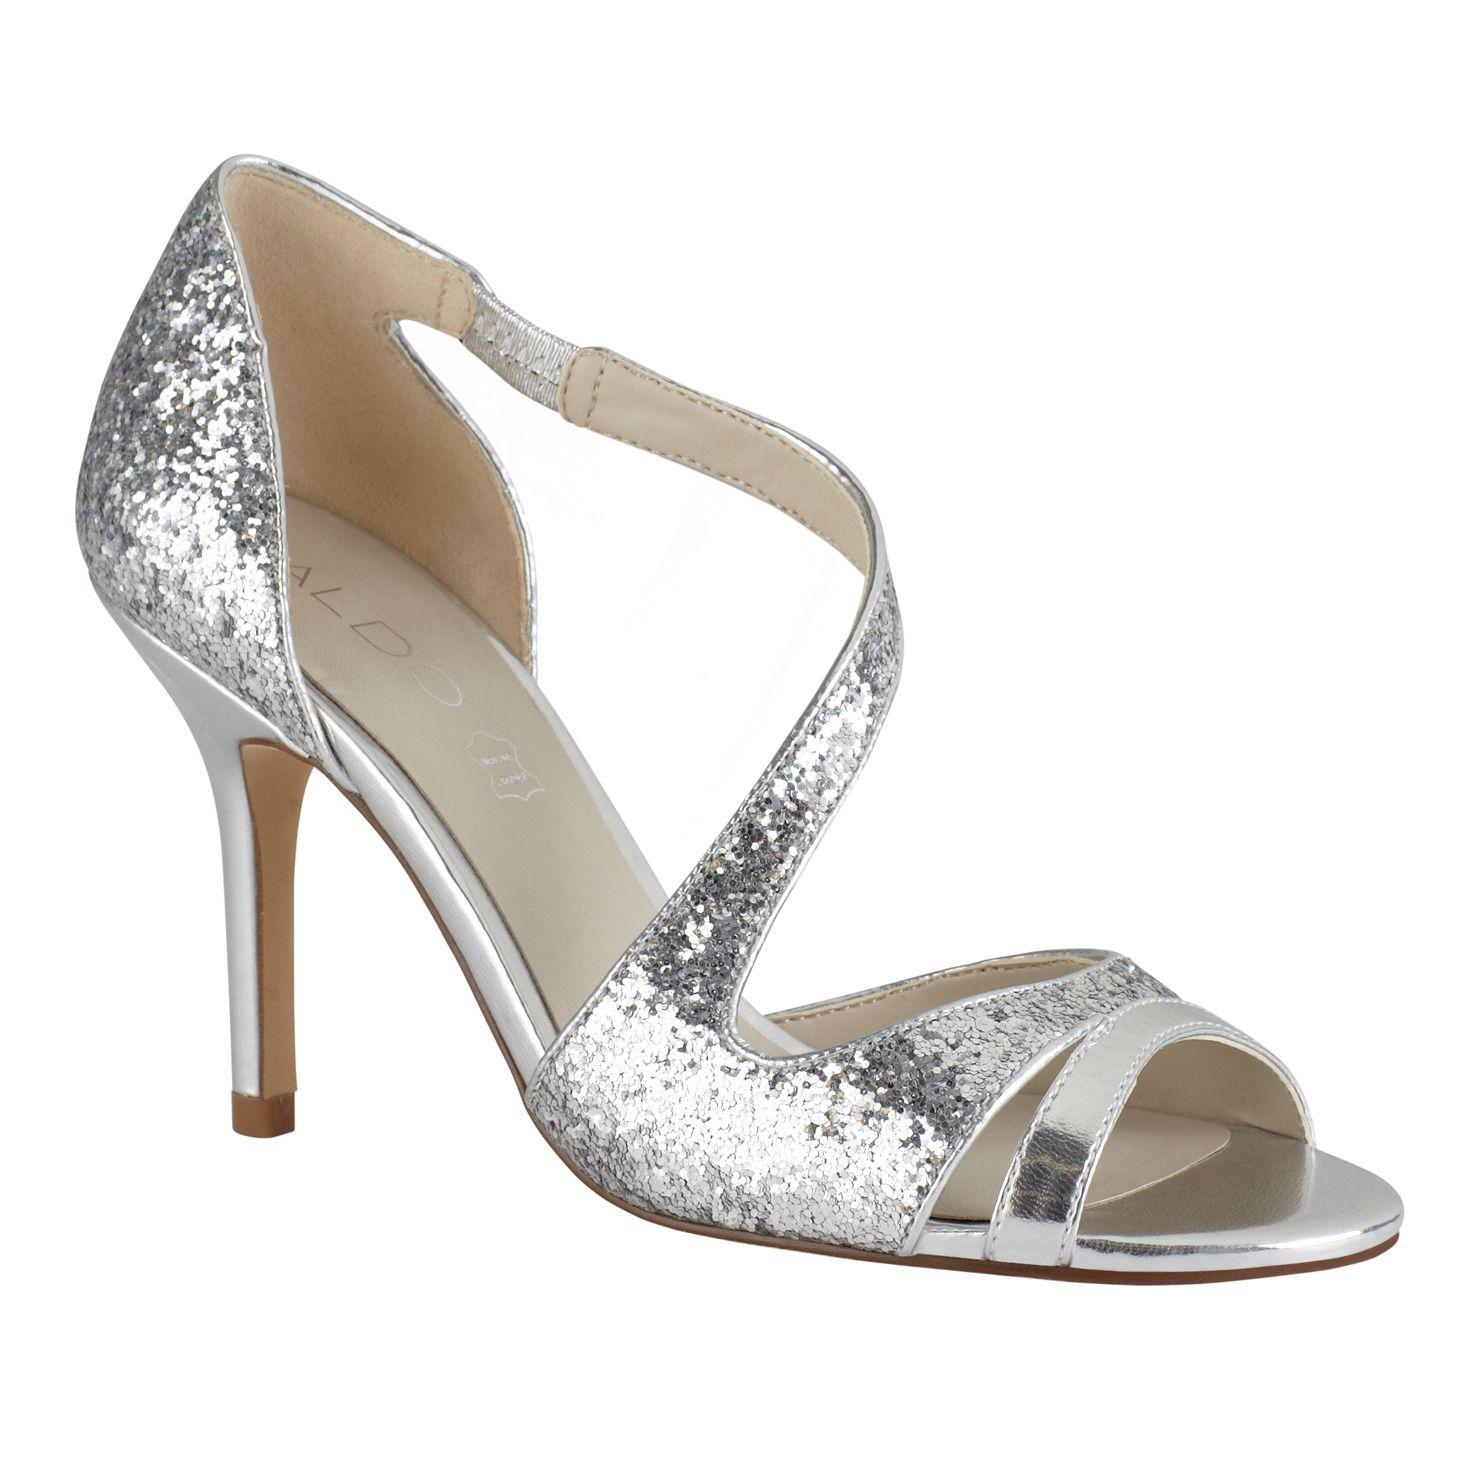 Bridal Shoes Aldo: Silver Wedding Shoes, Shoes, Silver